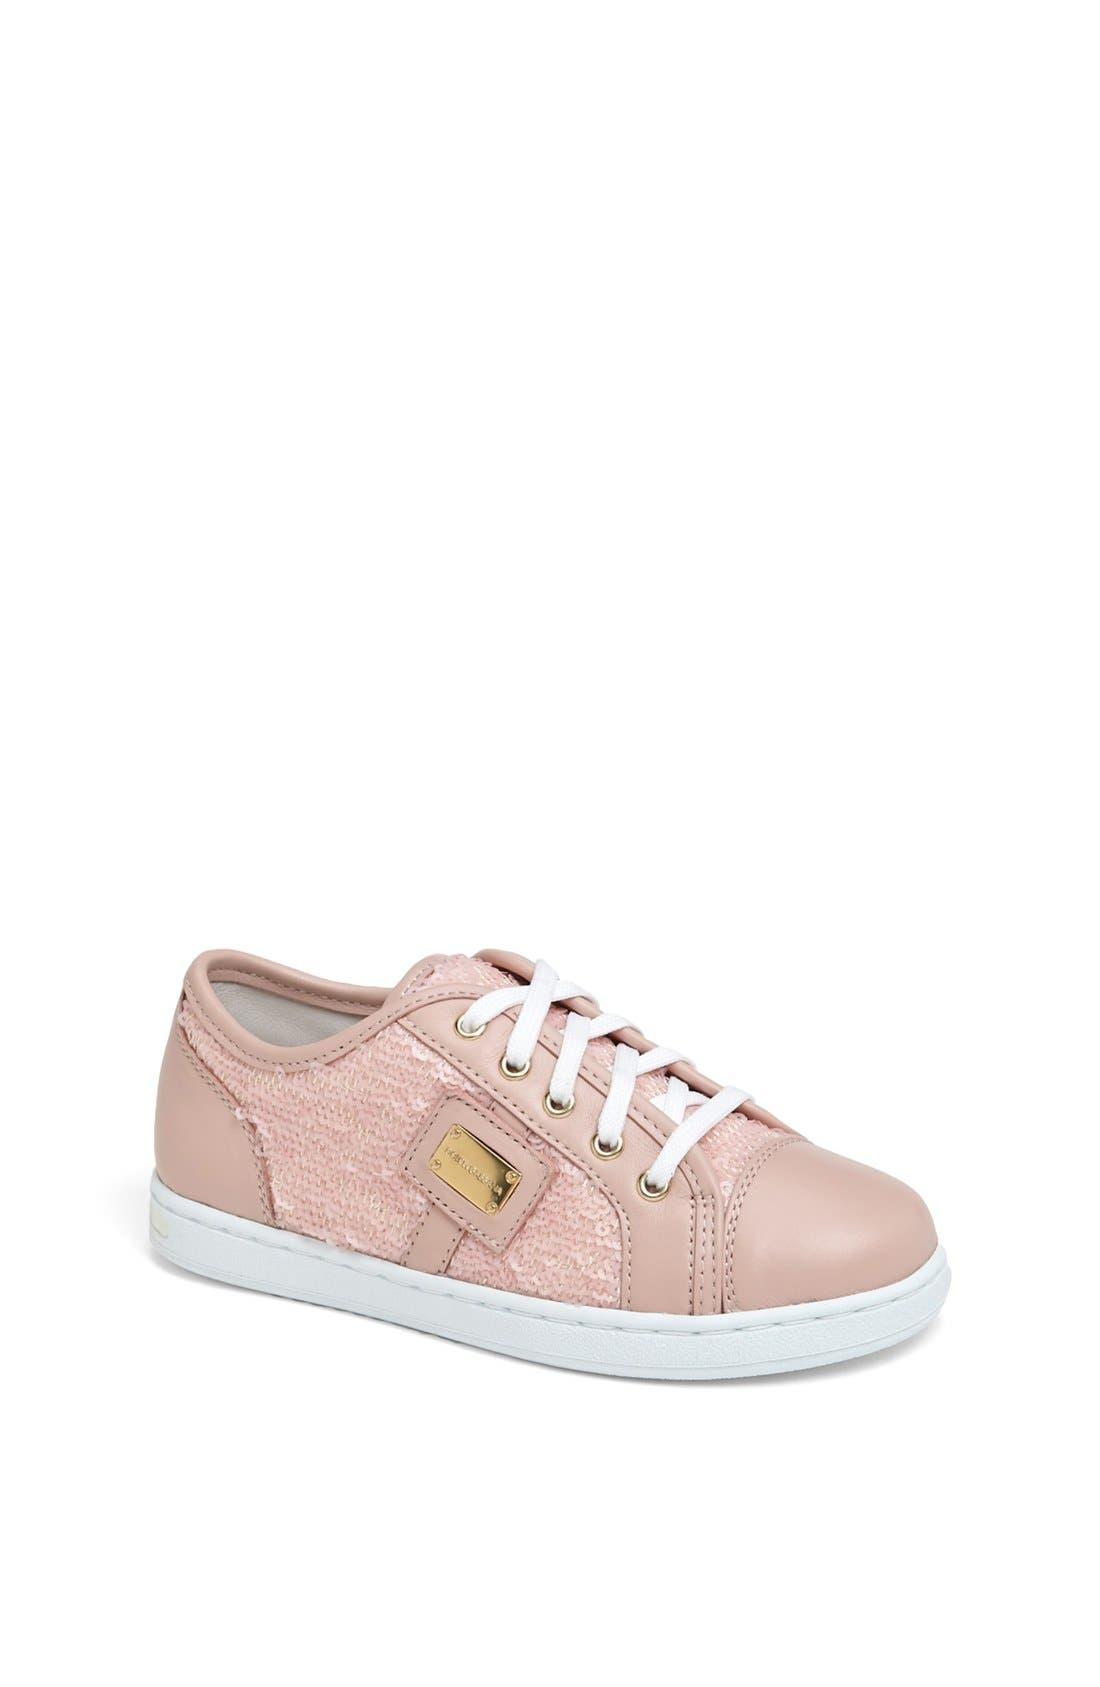 Main Image - Dolce&Gabbana Sequin Sneaker (Toddler & Little Kid)